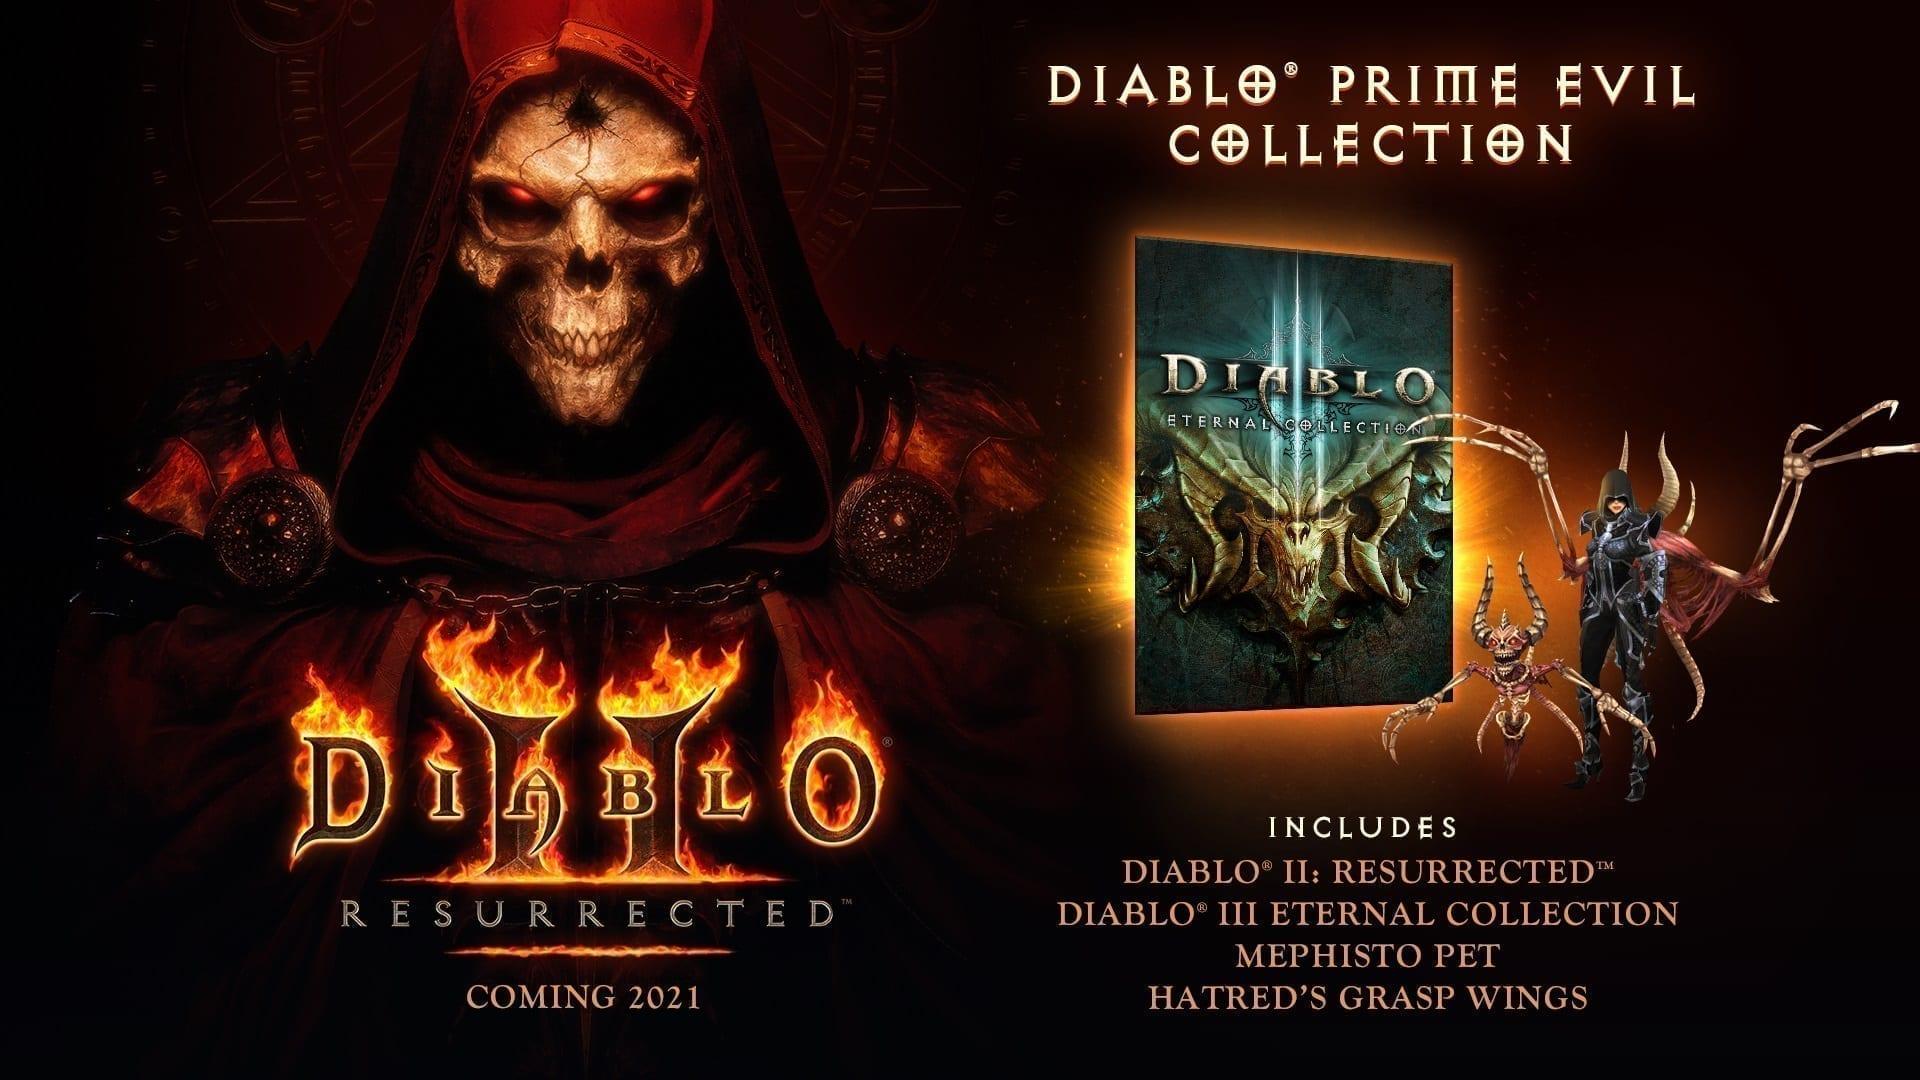 Add set to downloadsDiablo II: Resurrected - Prime Evil Collection